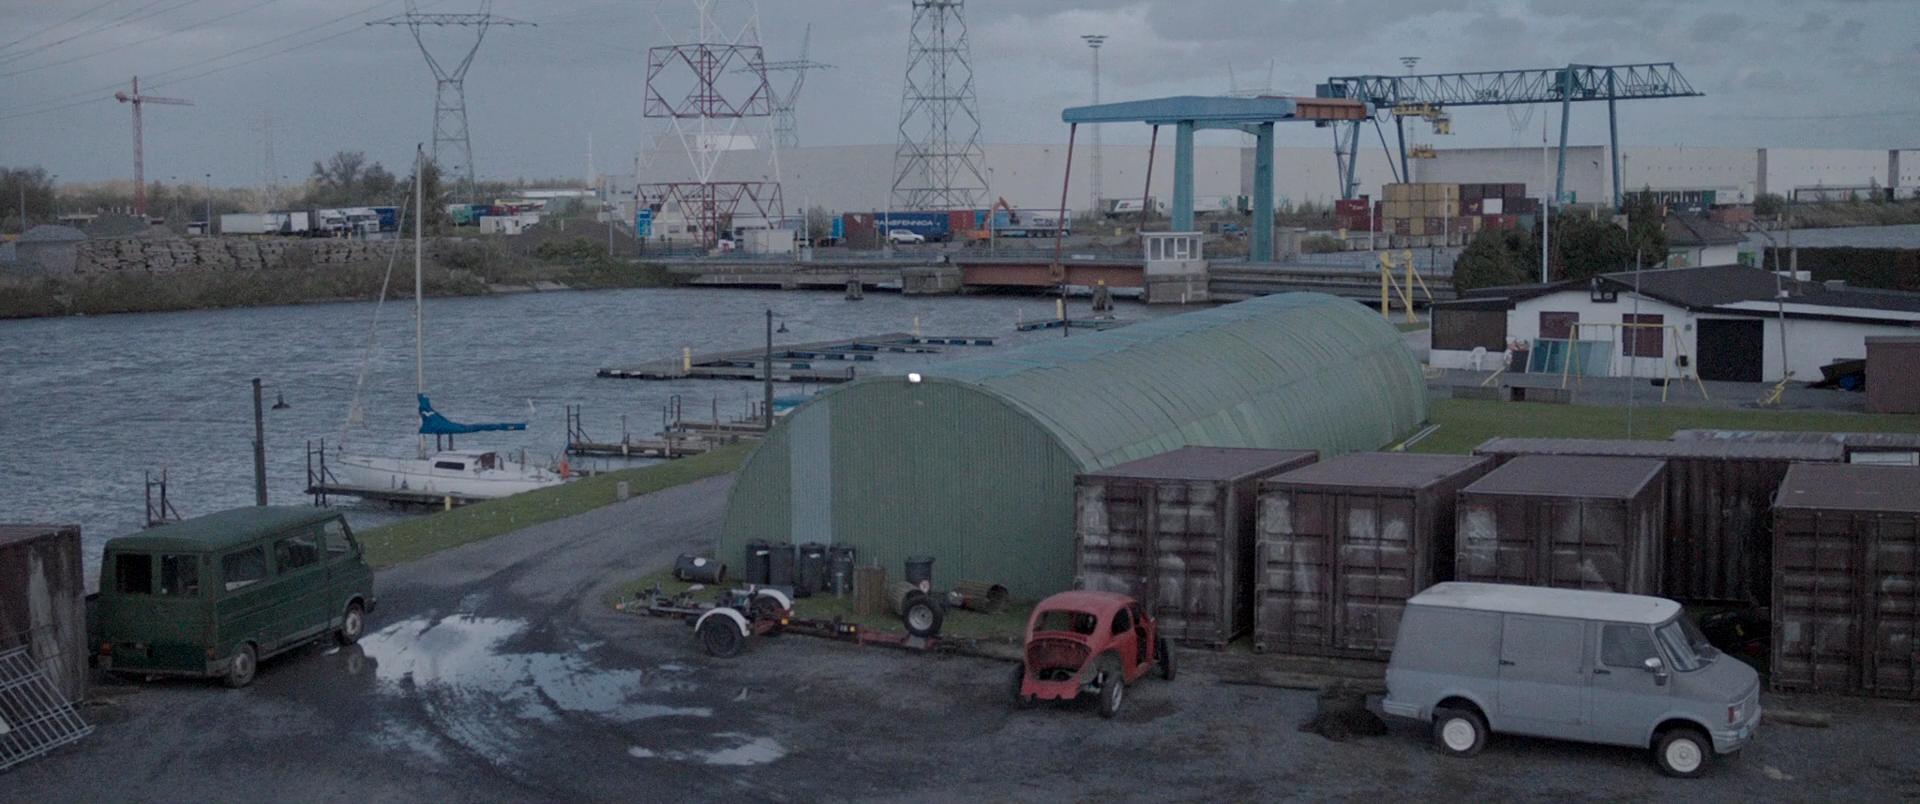 Bay Heineken'i Kaçirmak - Kidnapping Mr. Heineken 2015 (1080p BluRay) DUAL TR-EN - Full HD Film indir